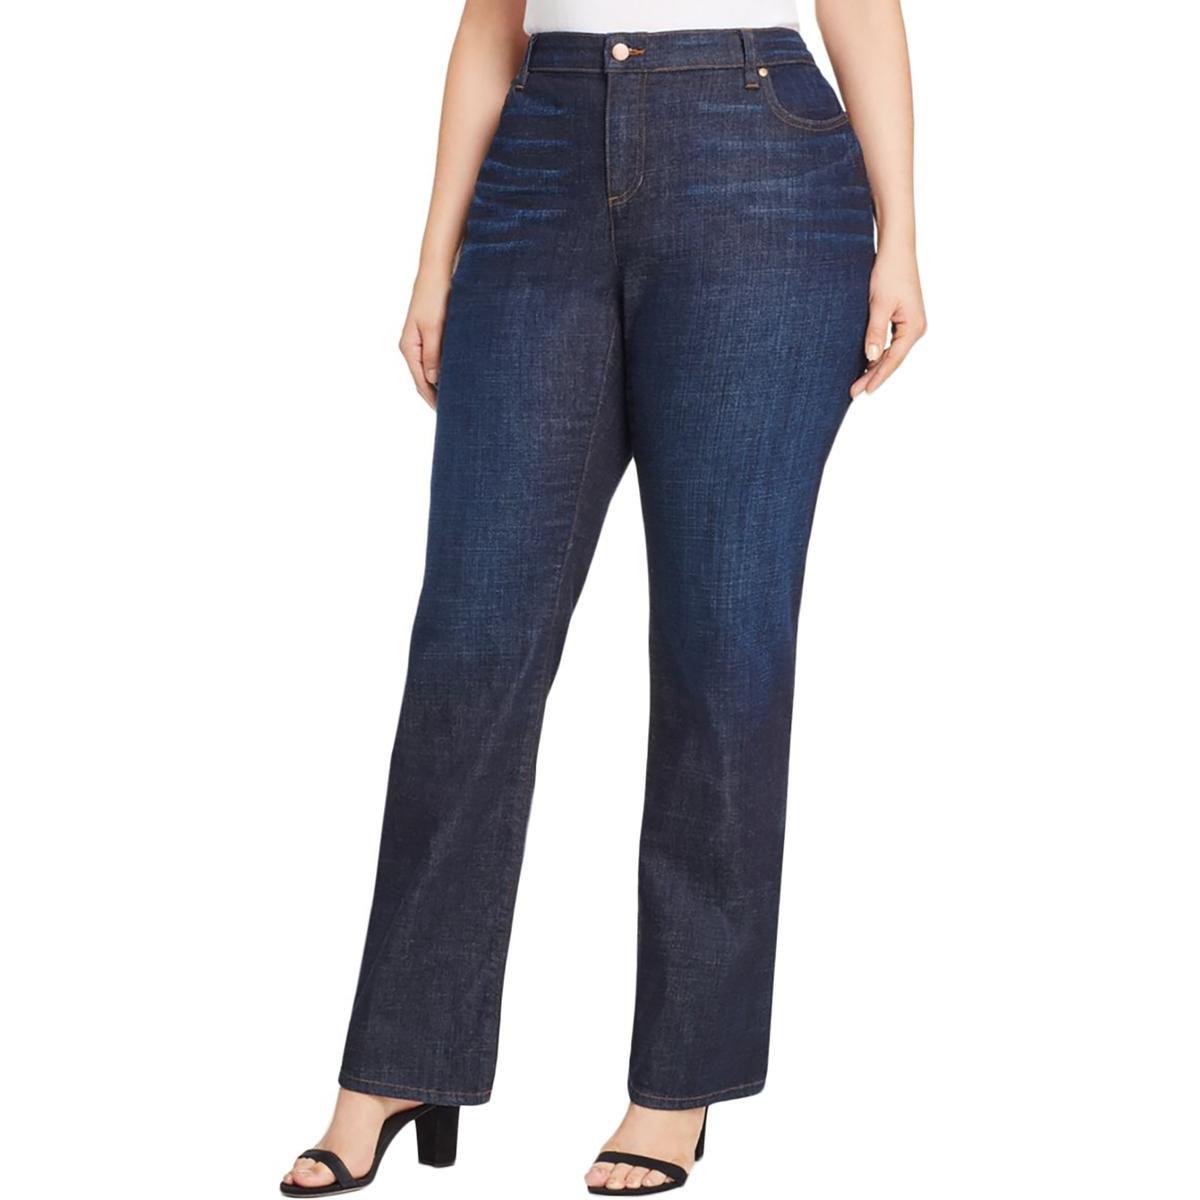 Eileen Fisher Womens Plus Bootcut Dark Wash Jeans Blue 24W